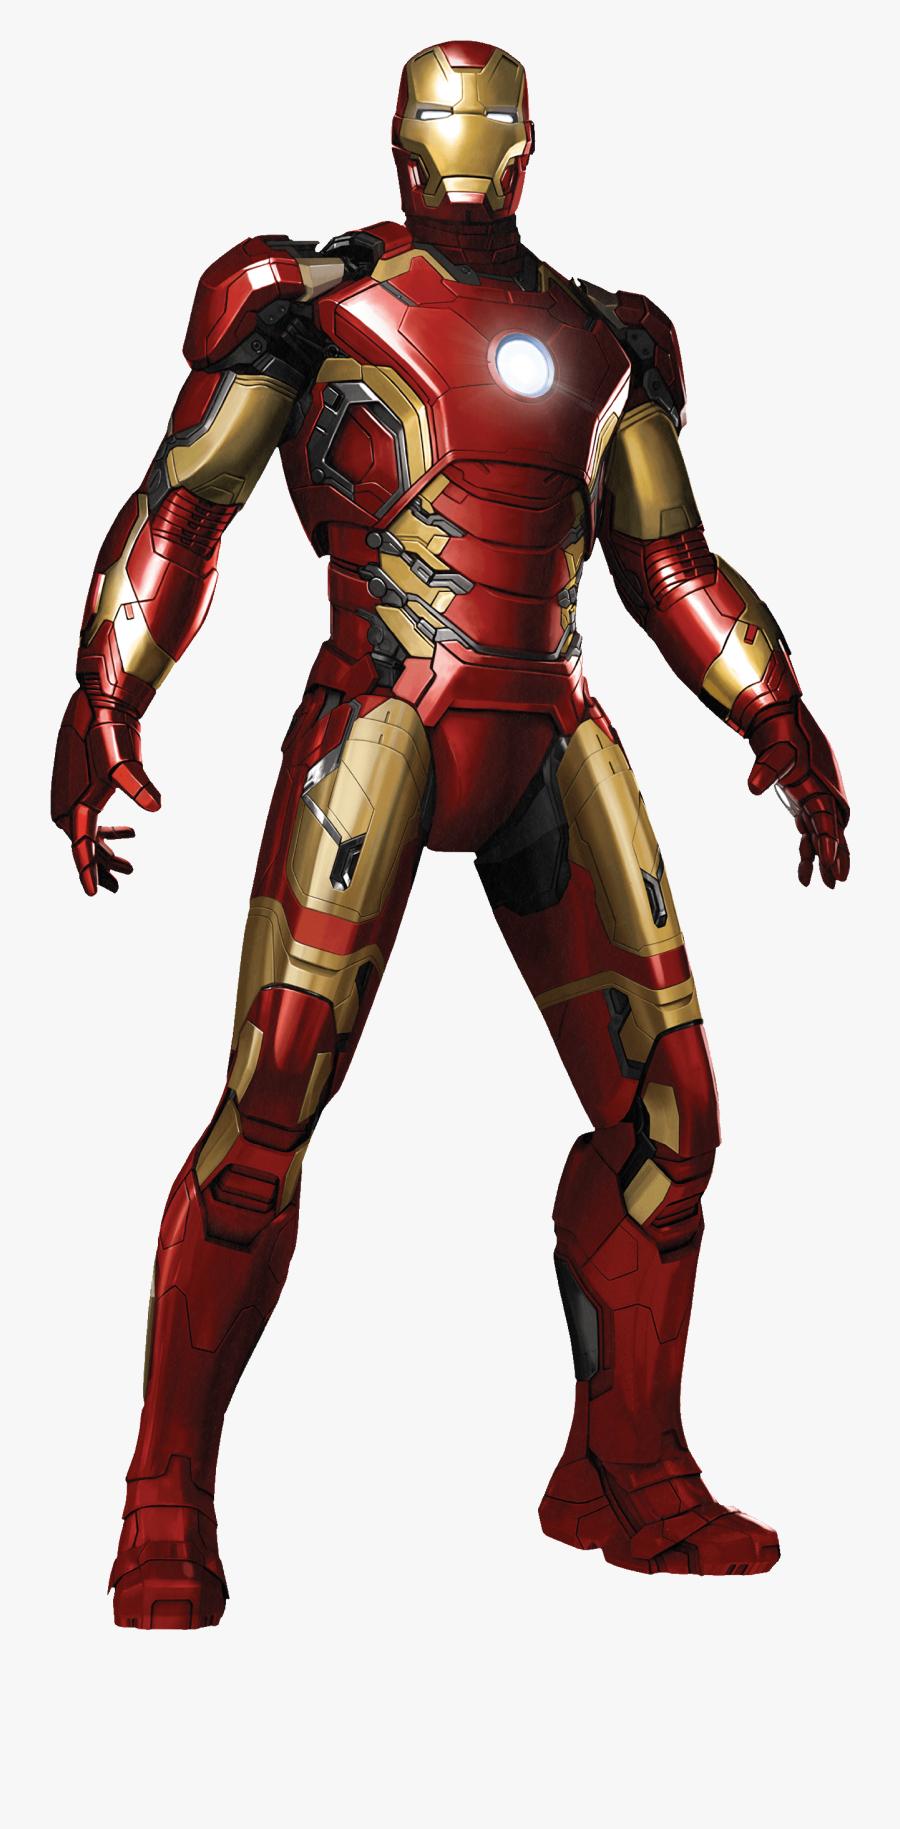 Iron Man Clipart Transparent Background - Avengers 2 Age Of Ultron Iron Man, Transparent Clipart